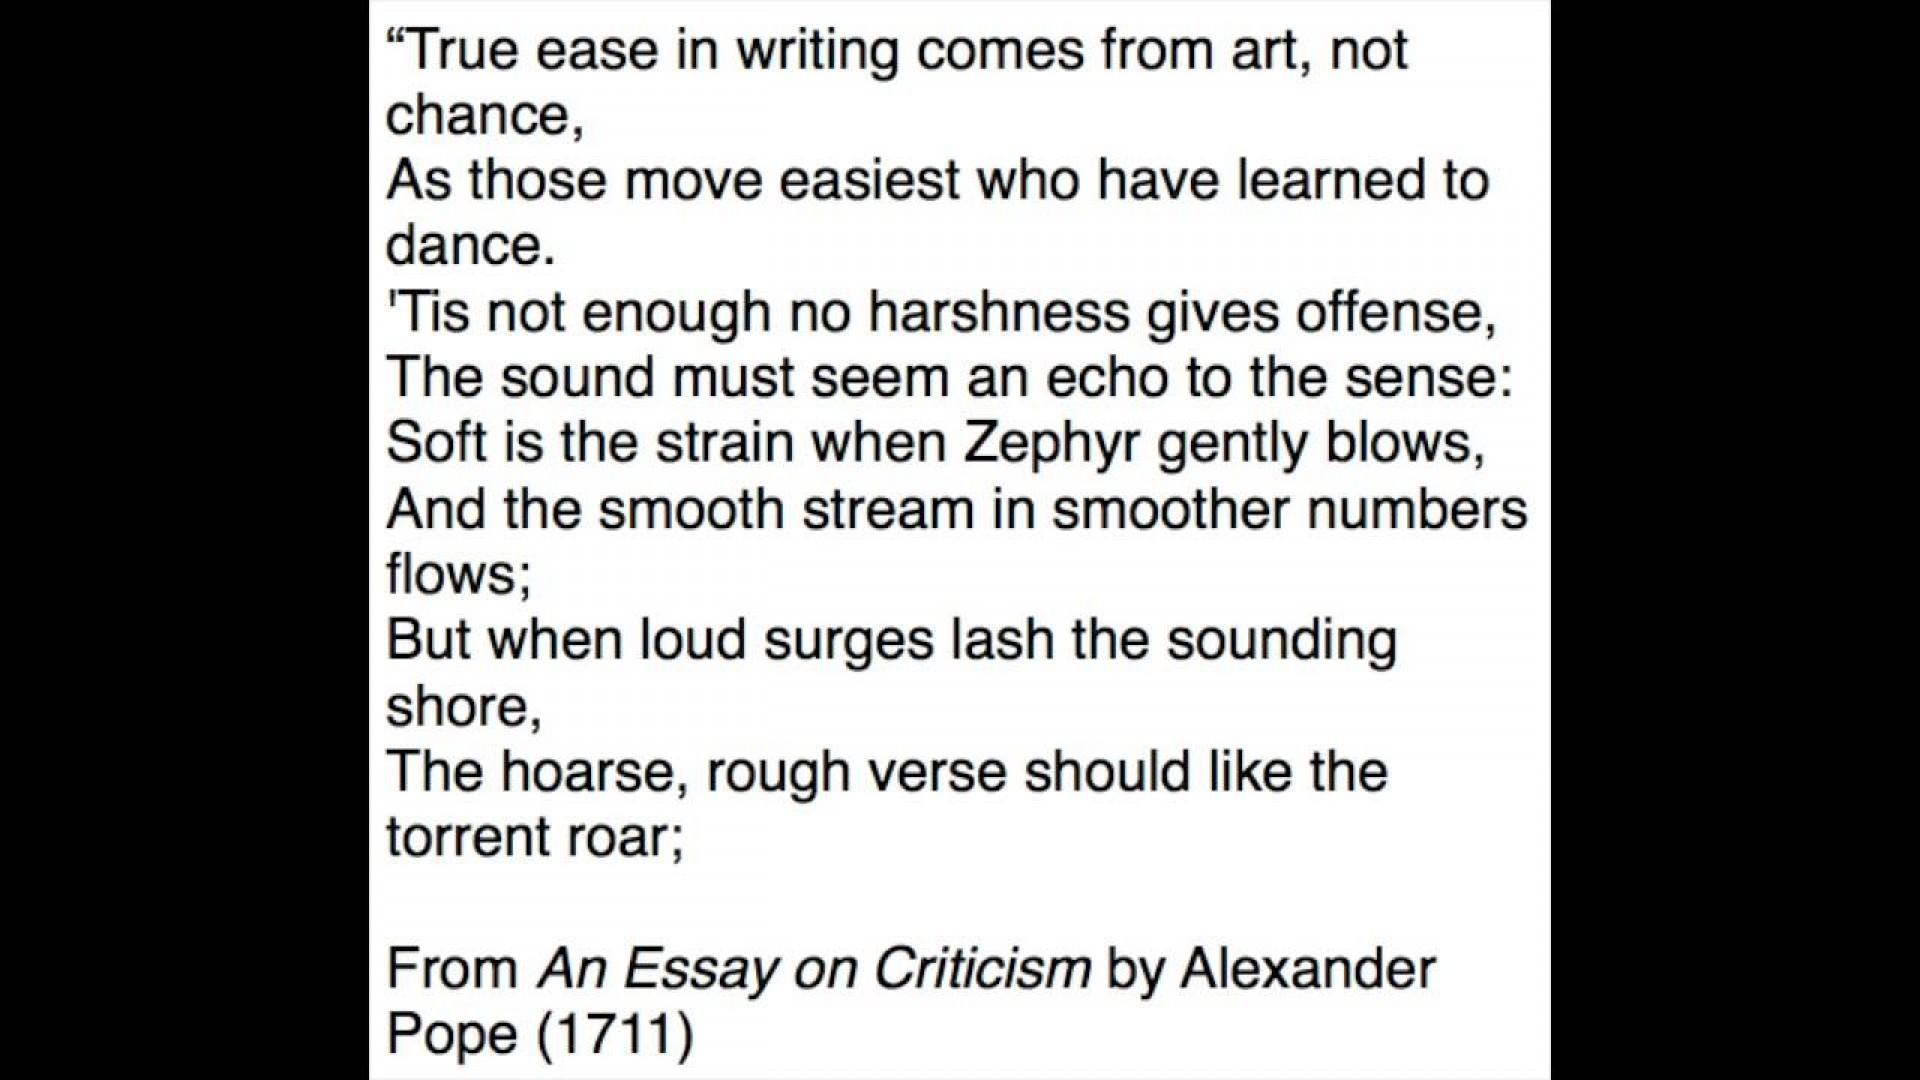 002 An Essay On Criticism Maxresdefault Sensational Lines 233 To 415 Part 3 Analysis Pdf 1920